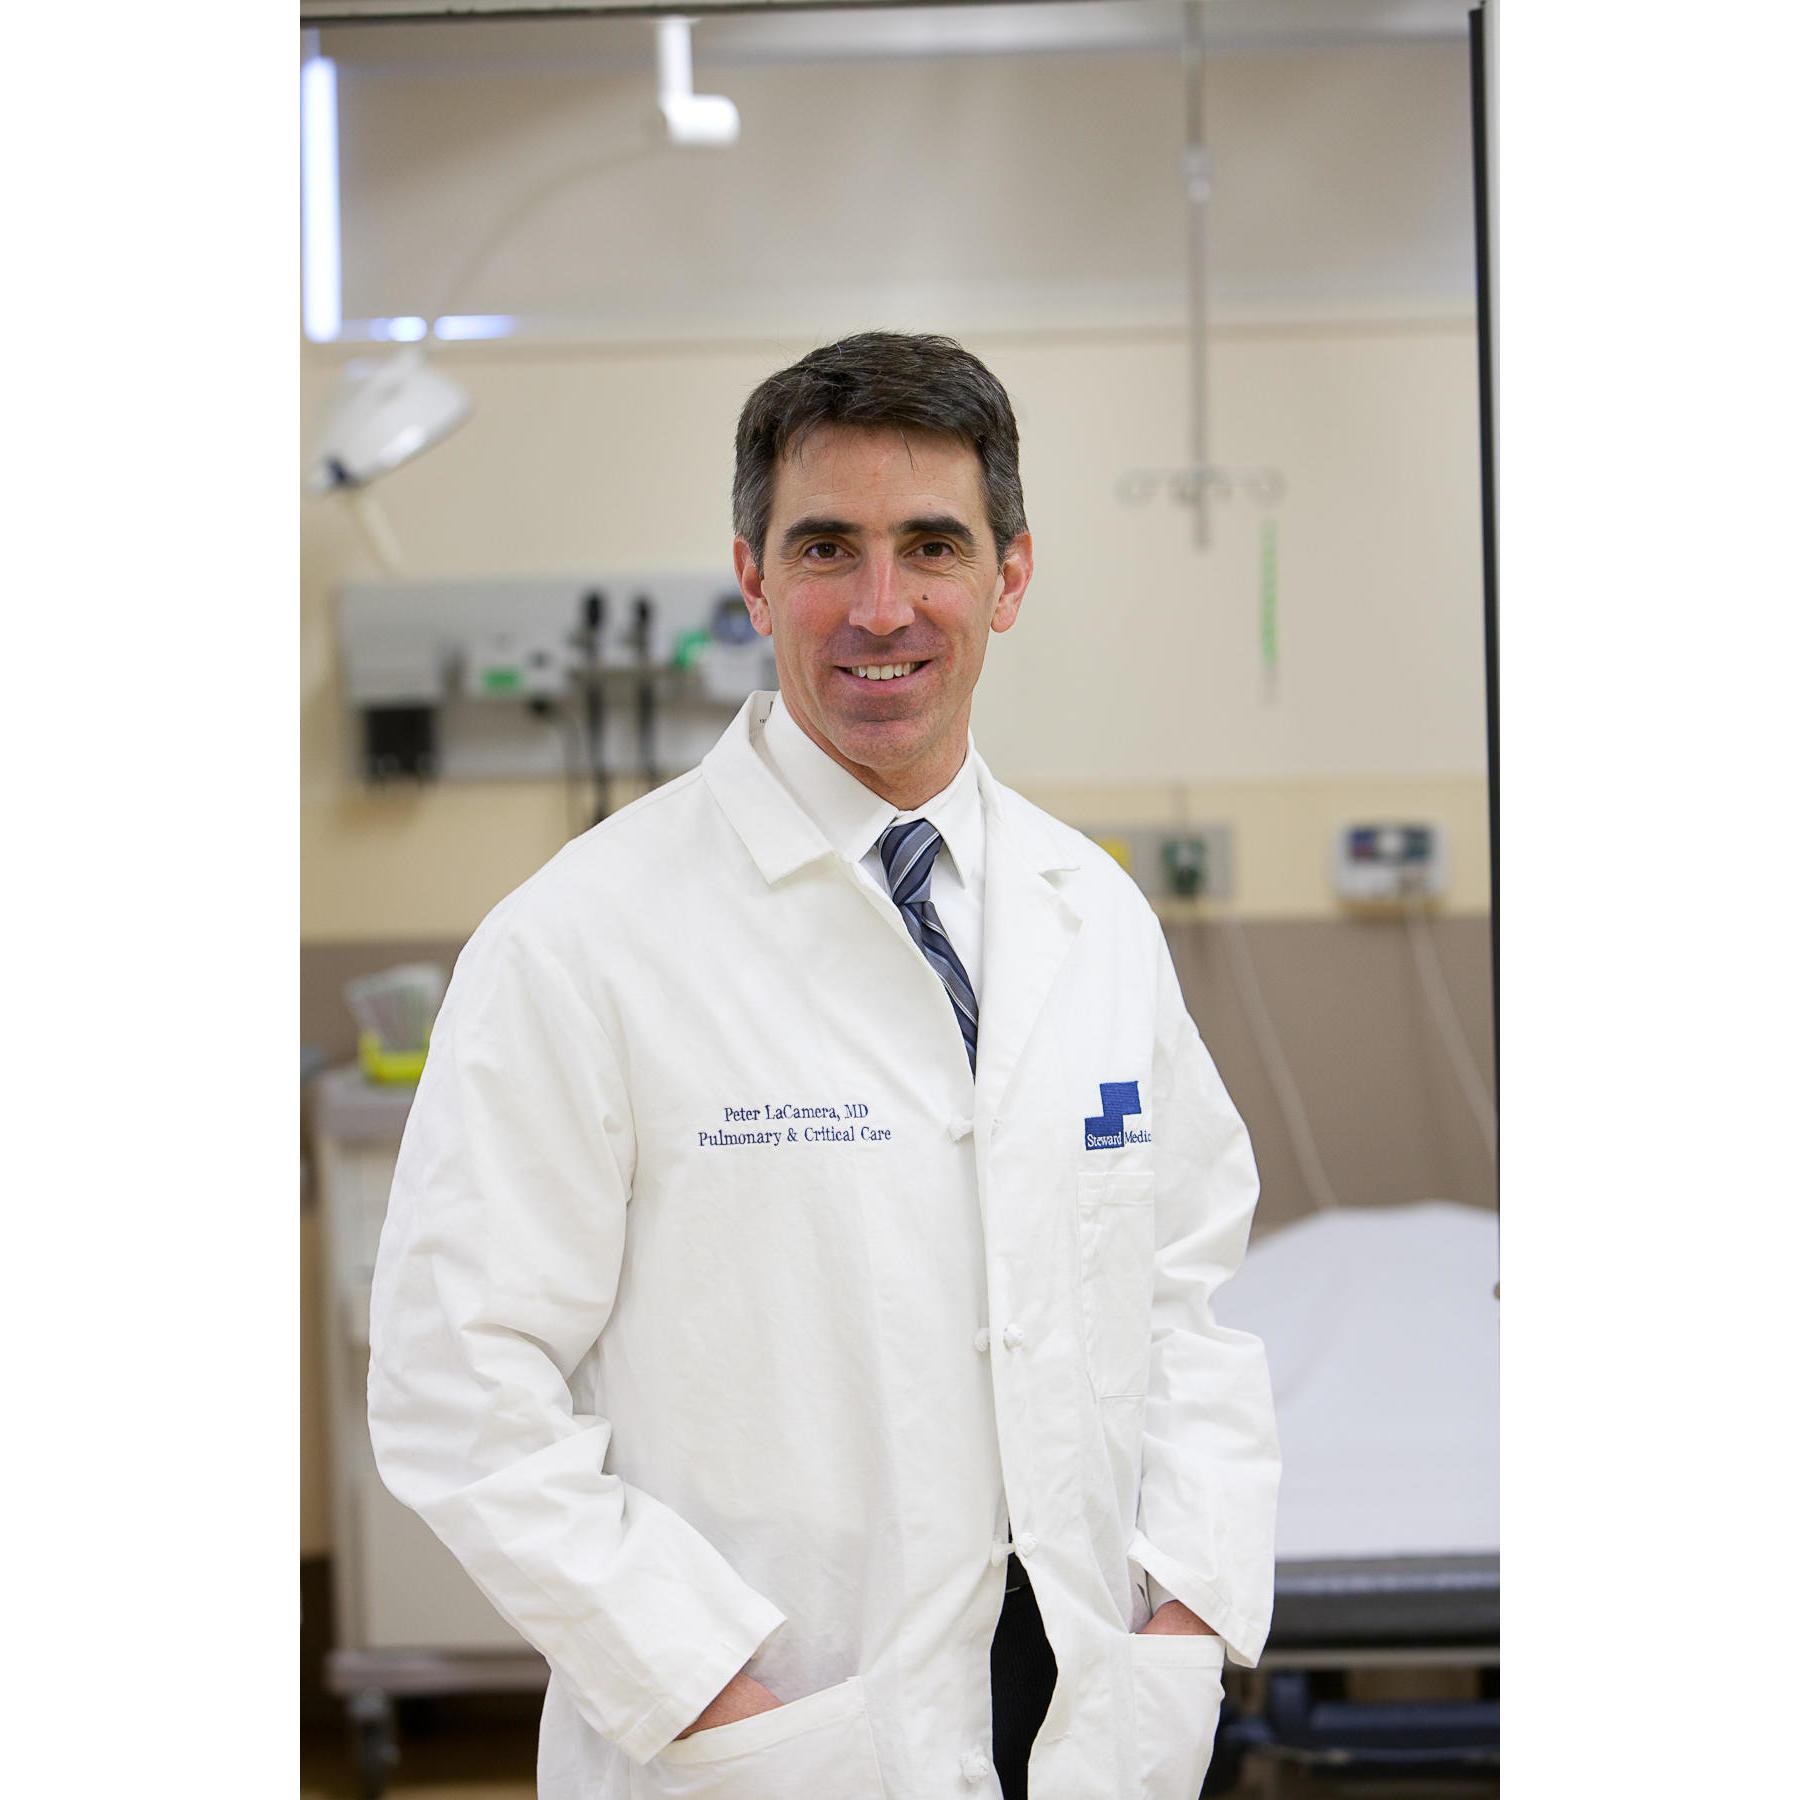 Peter P. Lacamera, MD